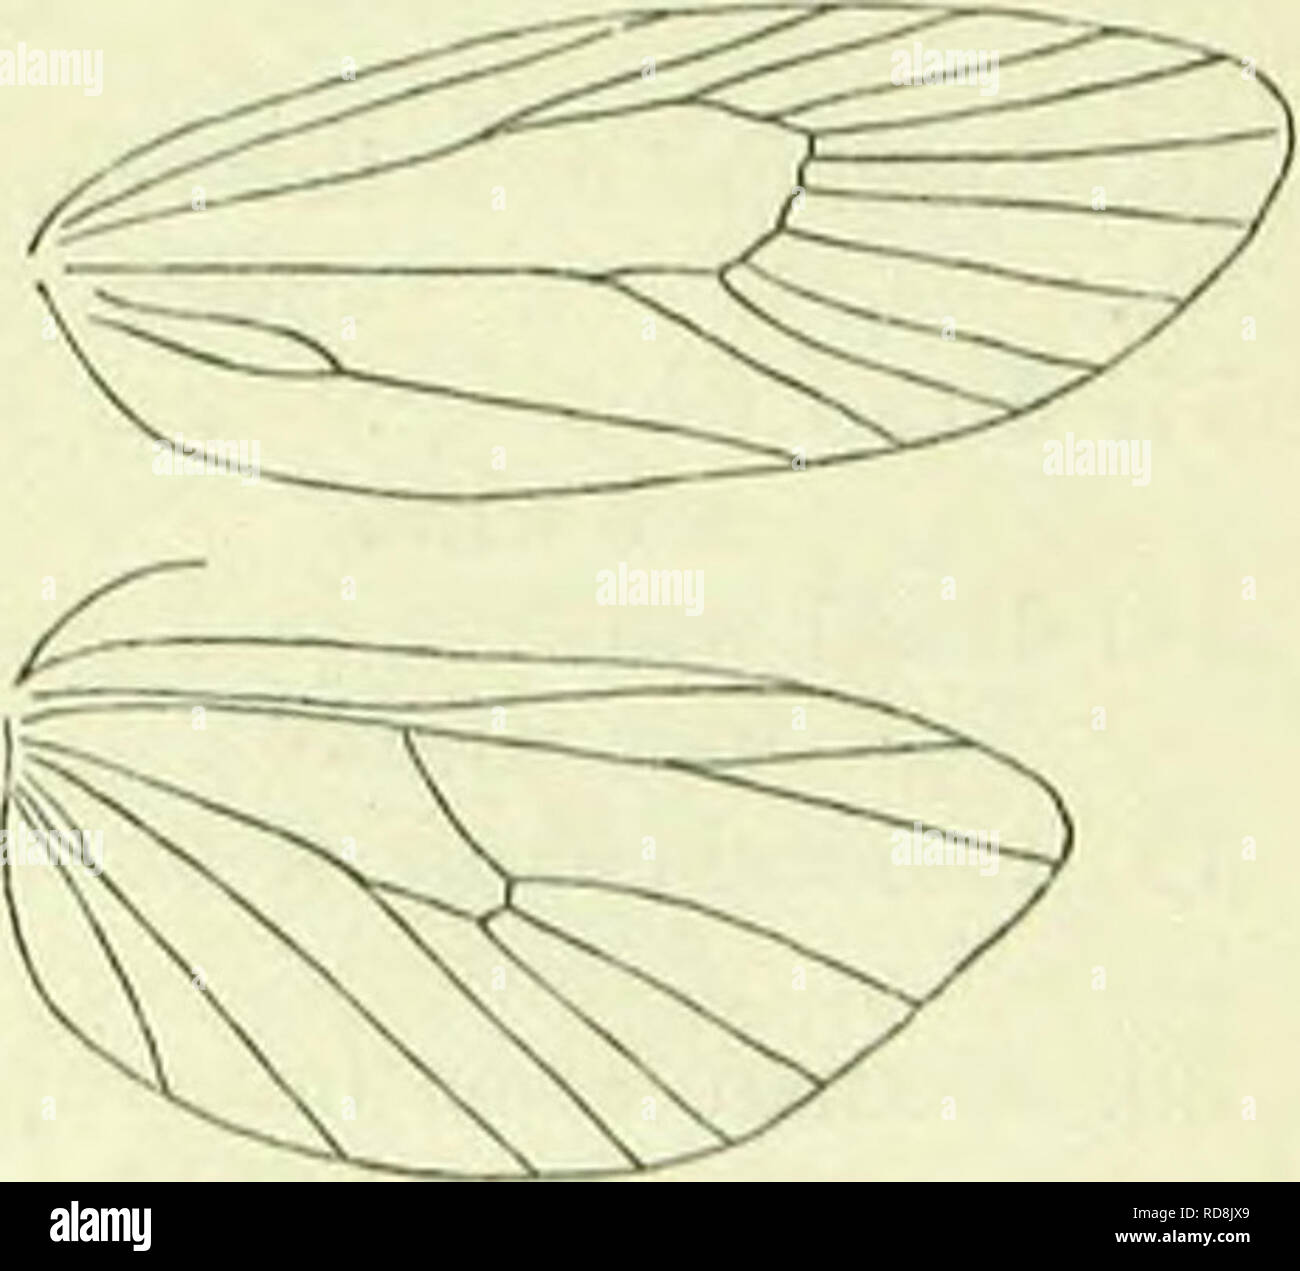 ". A handbook of British lepidoptera. Lepidoptera. lozopbra] I'llAl.OXJADAK feeding among seeds of UrribeUiferae, afterwards hybernating and pupating iii the stems. First fascia not reaching above middle . 2. dilucidana. "" entire or narrowly interrupted near costa I. J'rtincillana. 1. L. francillana, F. 14-18 mm. Forewings pale yellow; costal edge ferruginous on anterior half; two slender somewhat irregular dark ferruginous fasciae parallel to termen, first before middle, often narrowly interrupted near costa, second subterminal. Hindwings pale grey. England to Lancashire, E. Ireland, local; C. - Stock Image"